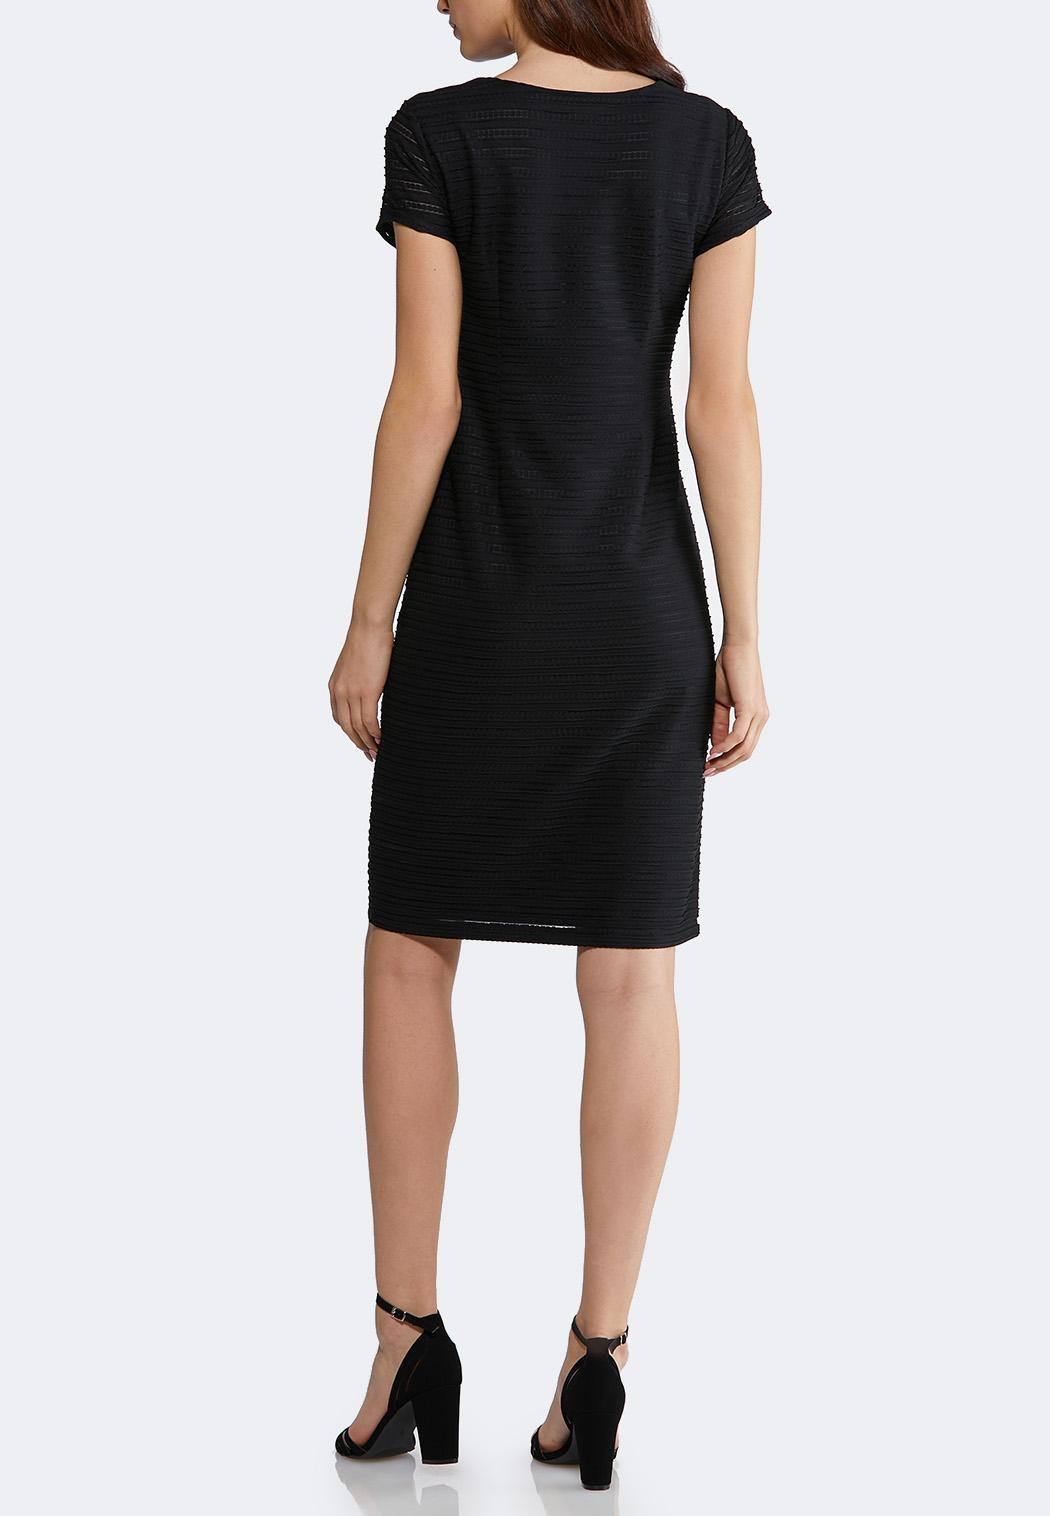 1776f11492a1 Plus Size Solid Textured Midi Dress alternate view ...